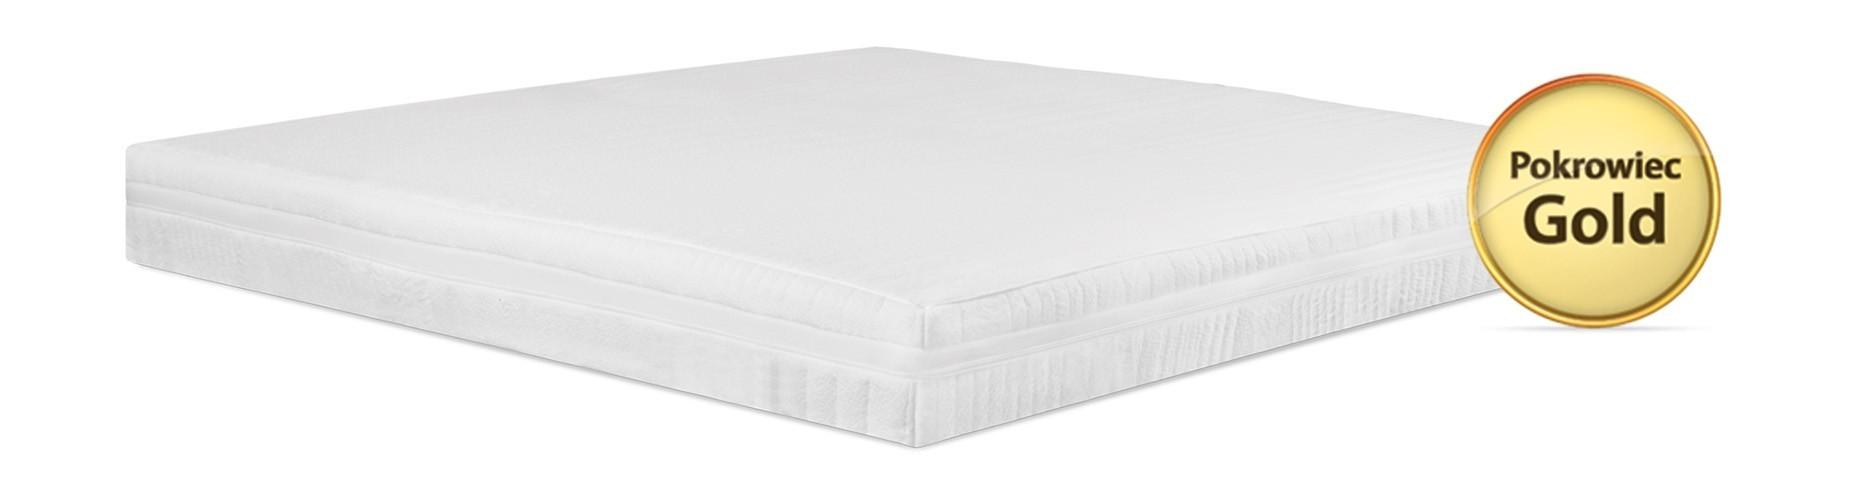 Materac sprężynowy Comfort Exclusive